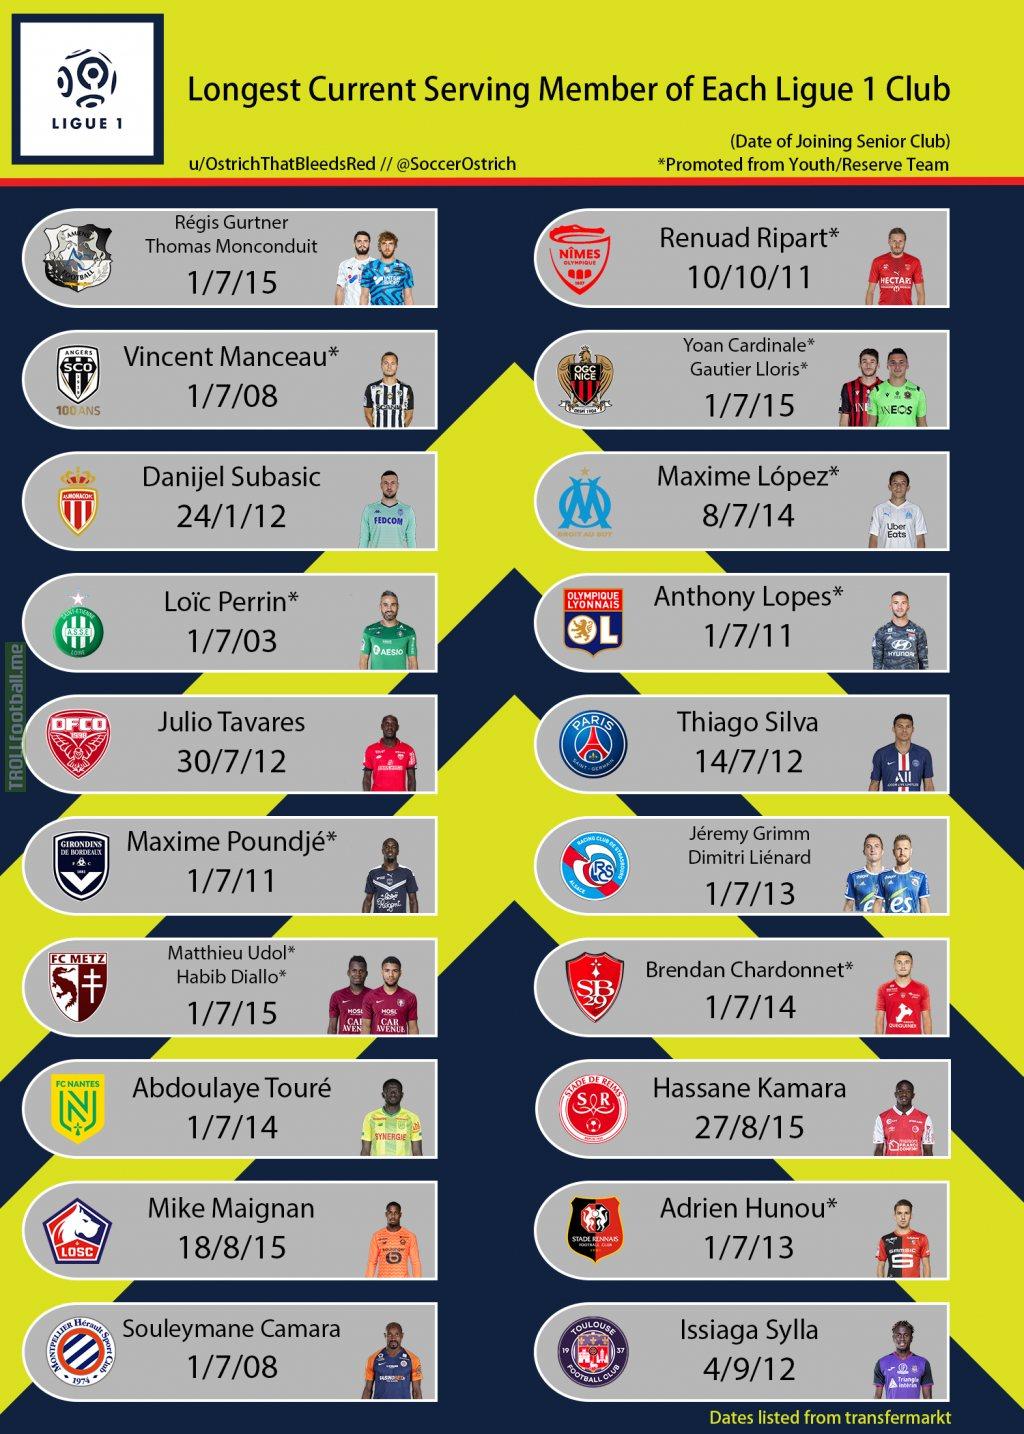 [OC] Longest Current Serving Member of Each Ligue 1 Club